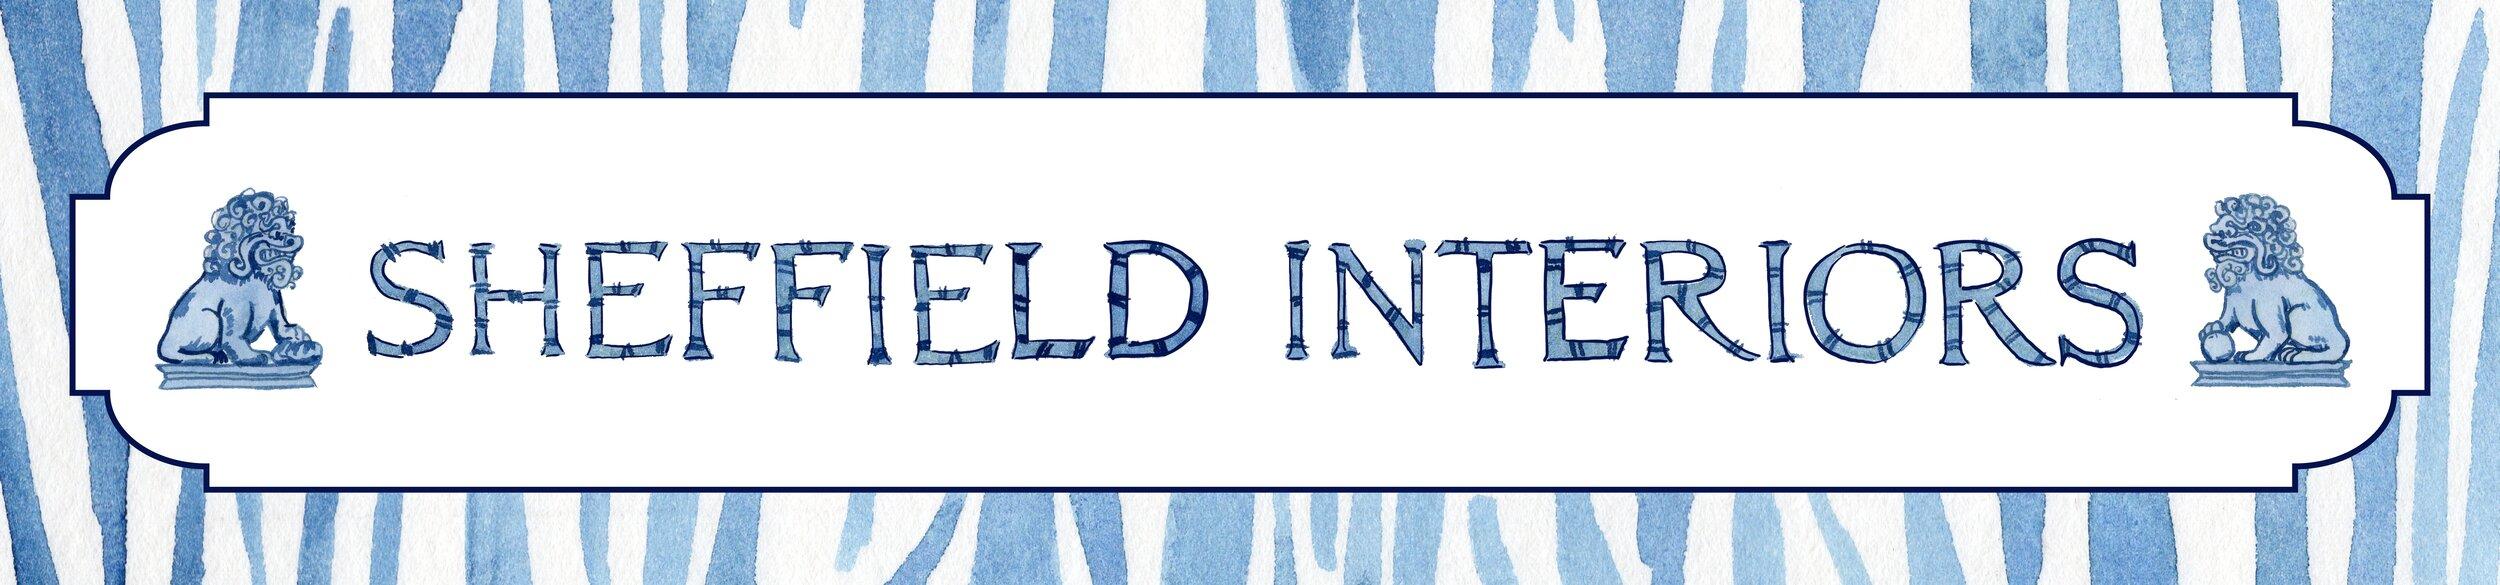 Sheffield Interiors long format logo